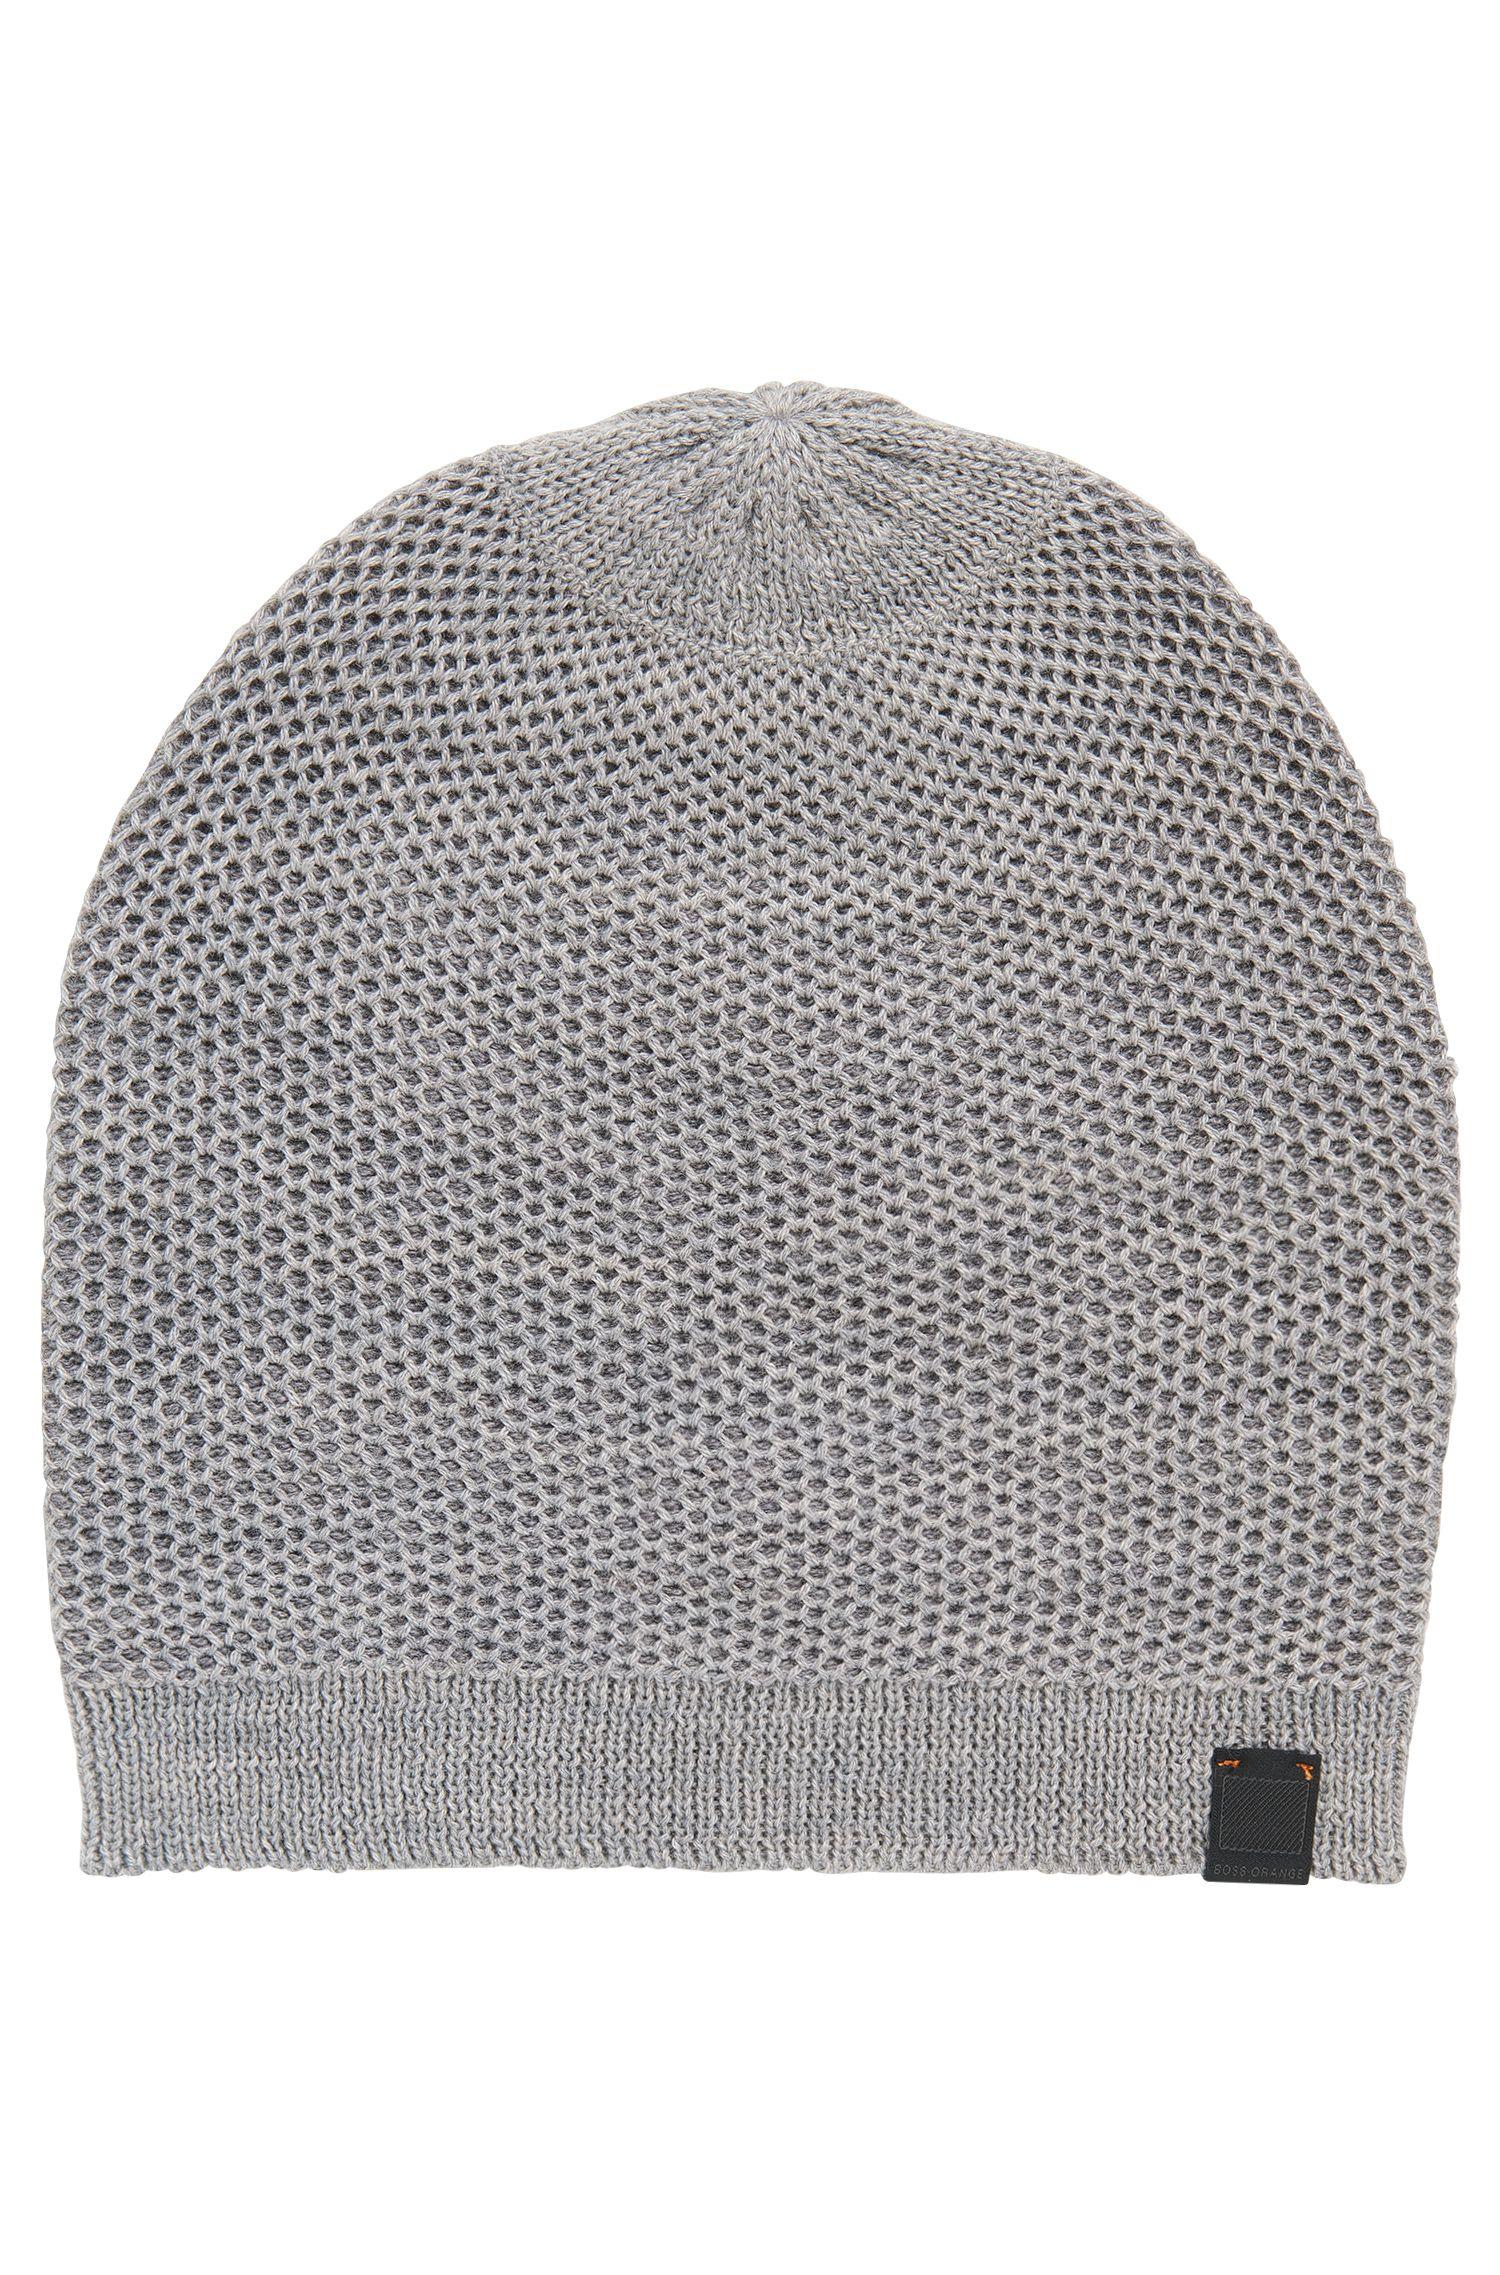 'Franek' | Wool Blend Knit Beanie